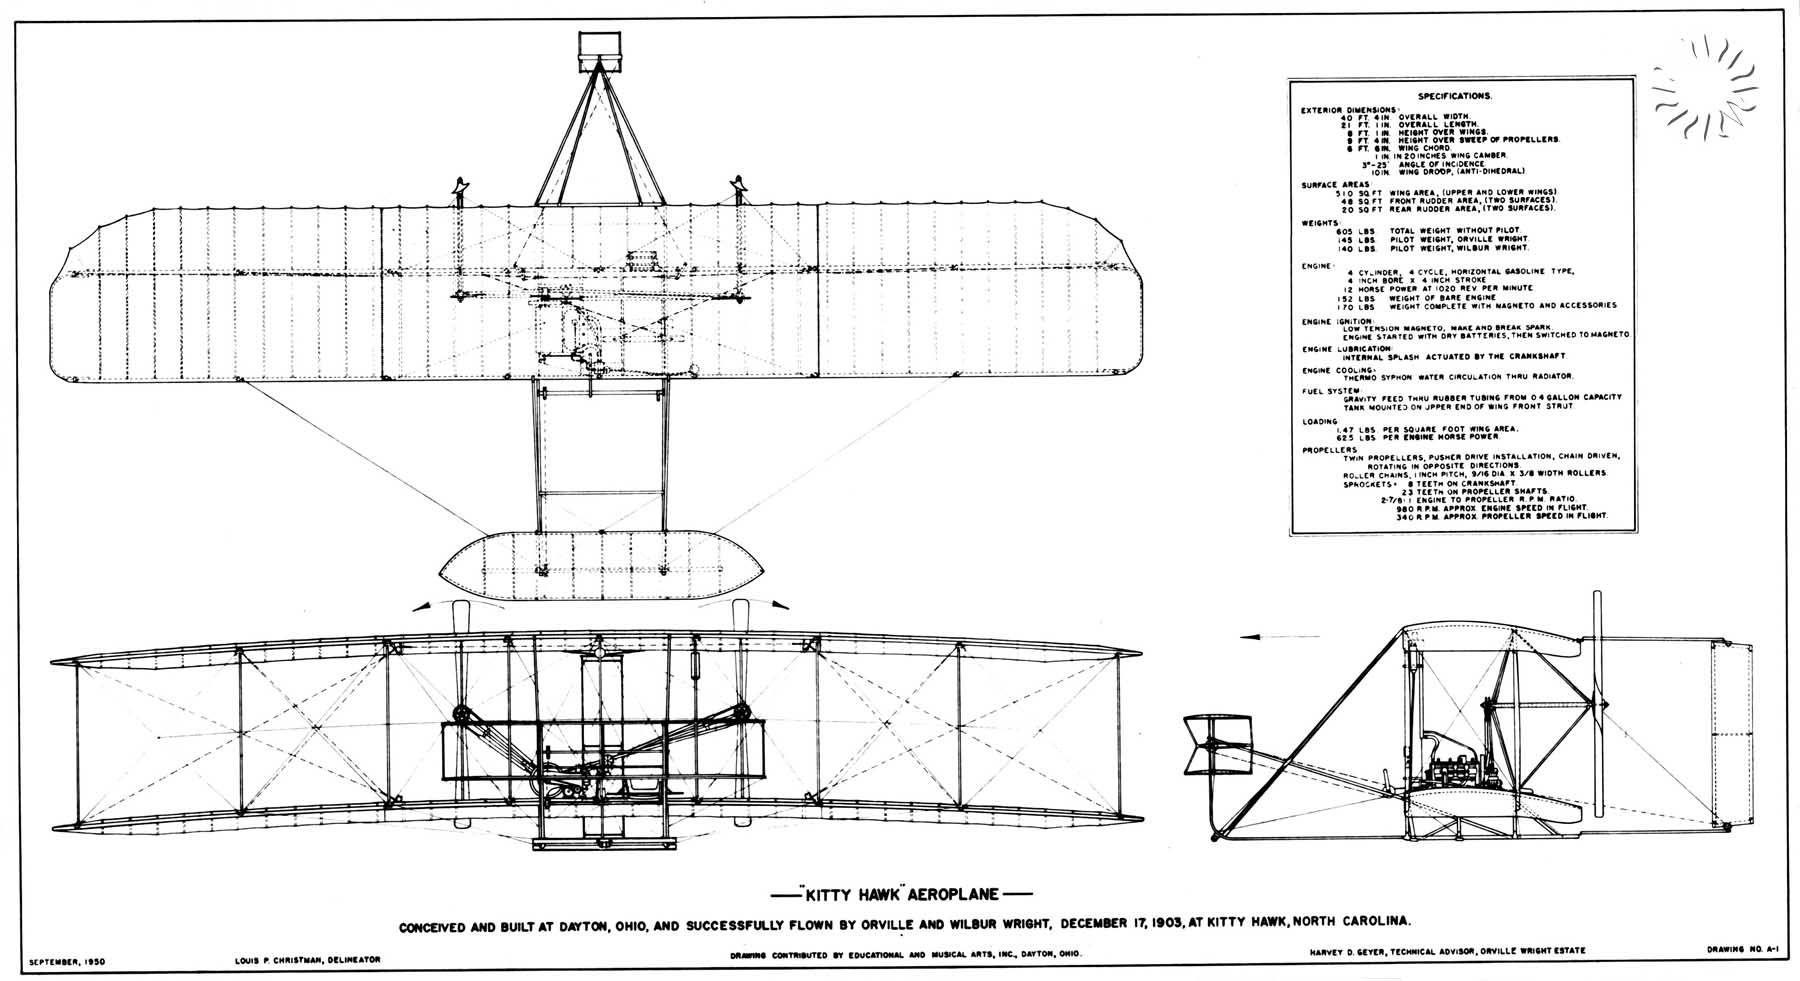 Kitty Hawk Aeroplane Education Wright Brothers